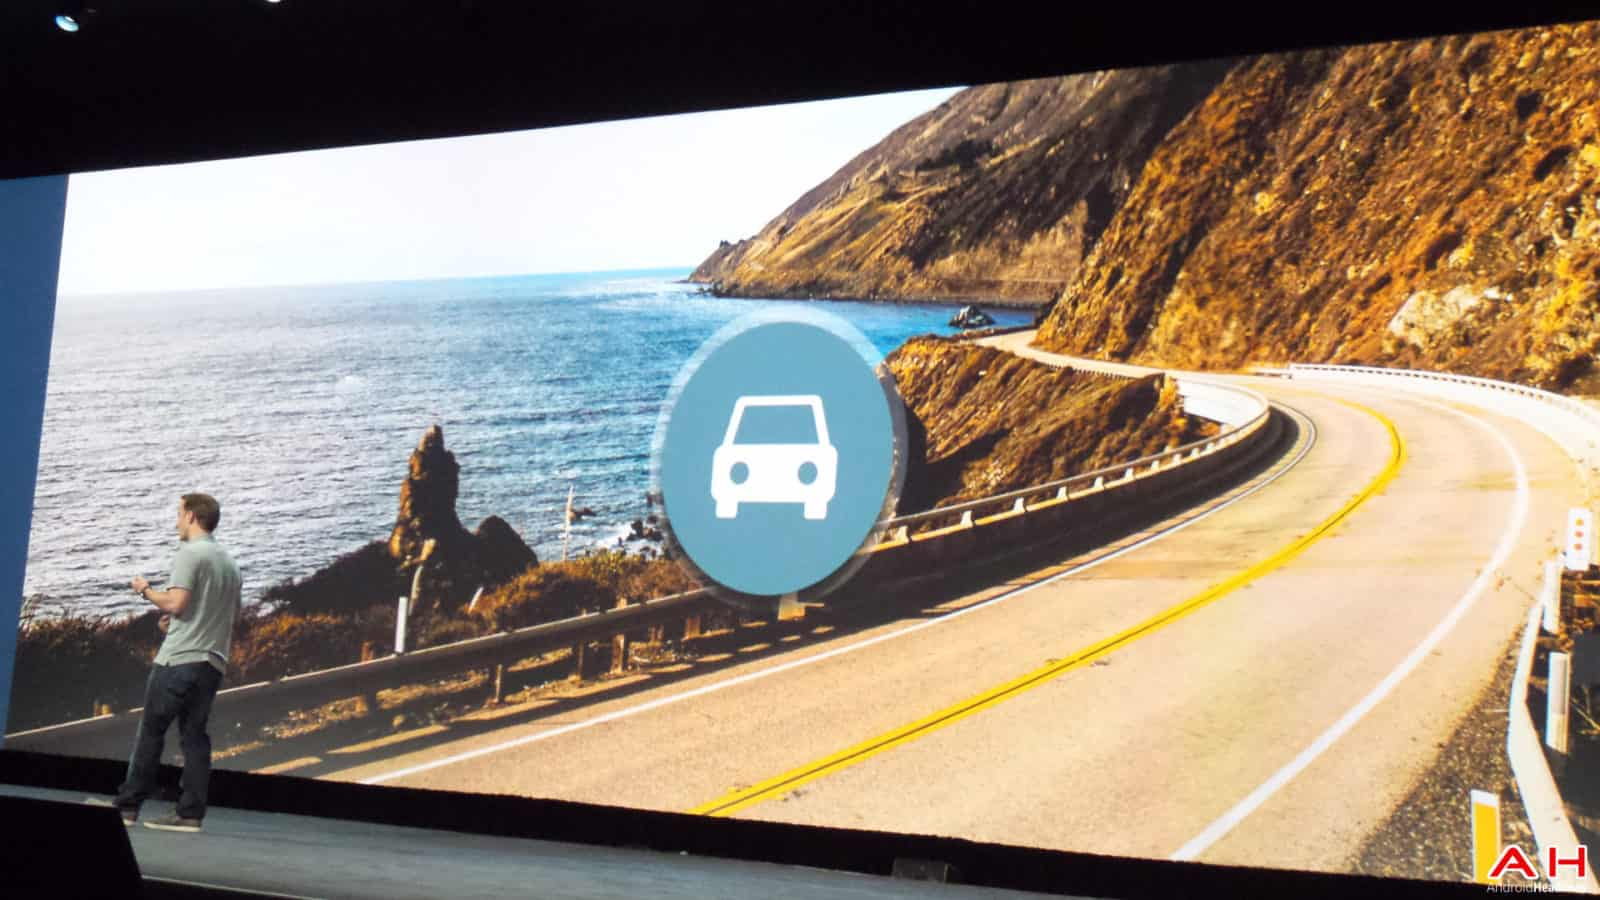 AH Google IO 2014 (600 of 6) Android Auto Logo 1.3